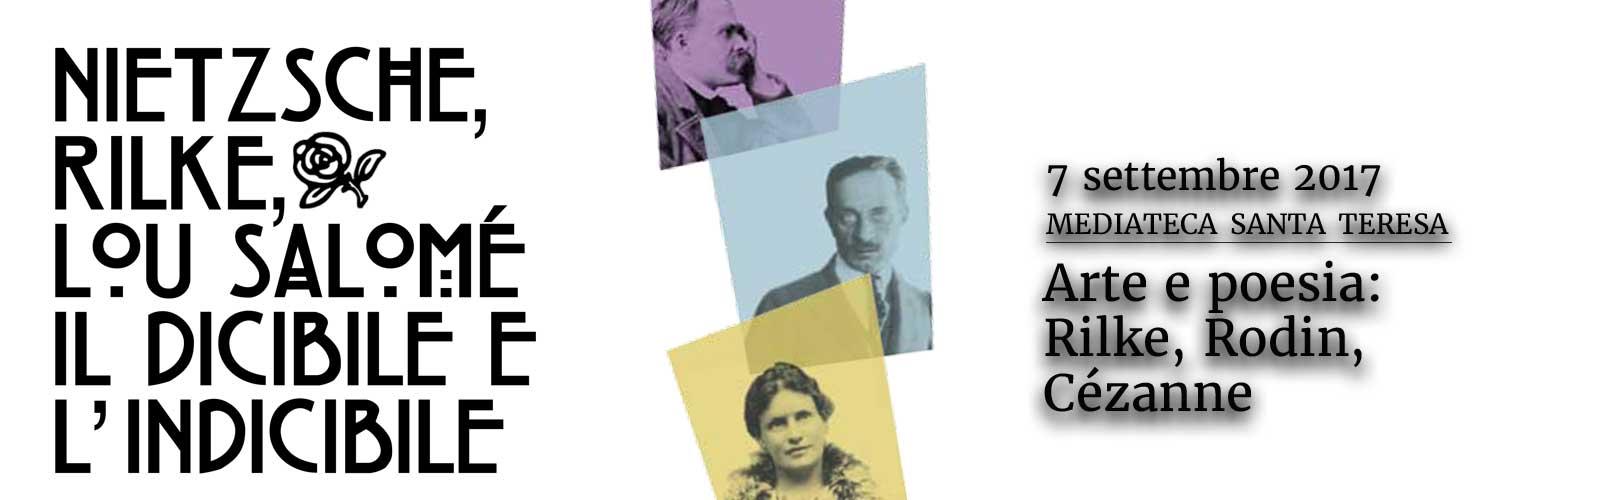 Arte e poesia: Rilke, Rodin, Cézanne